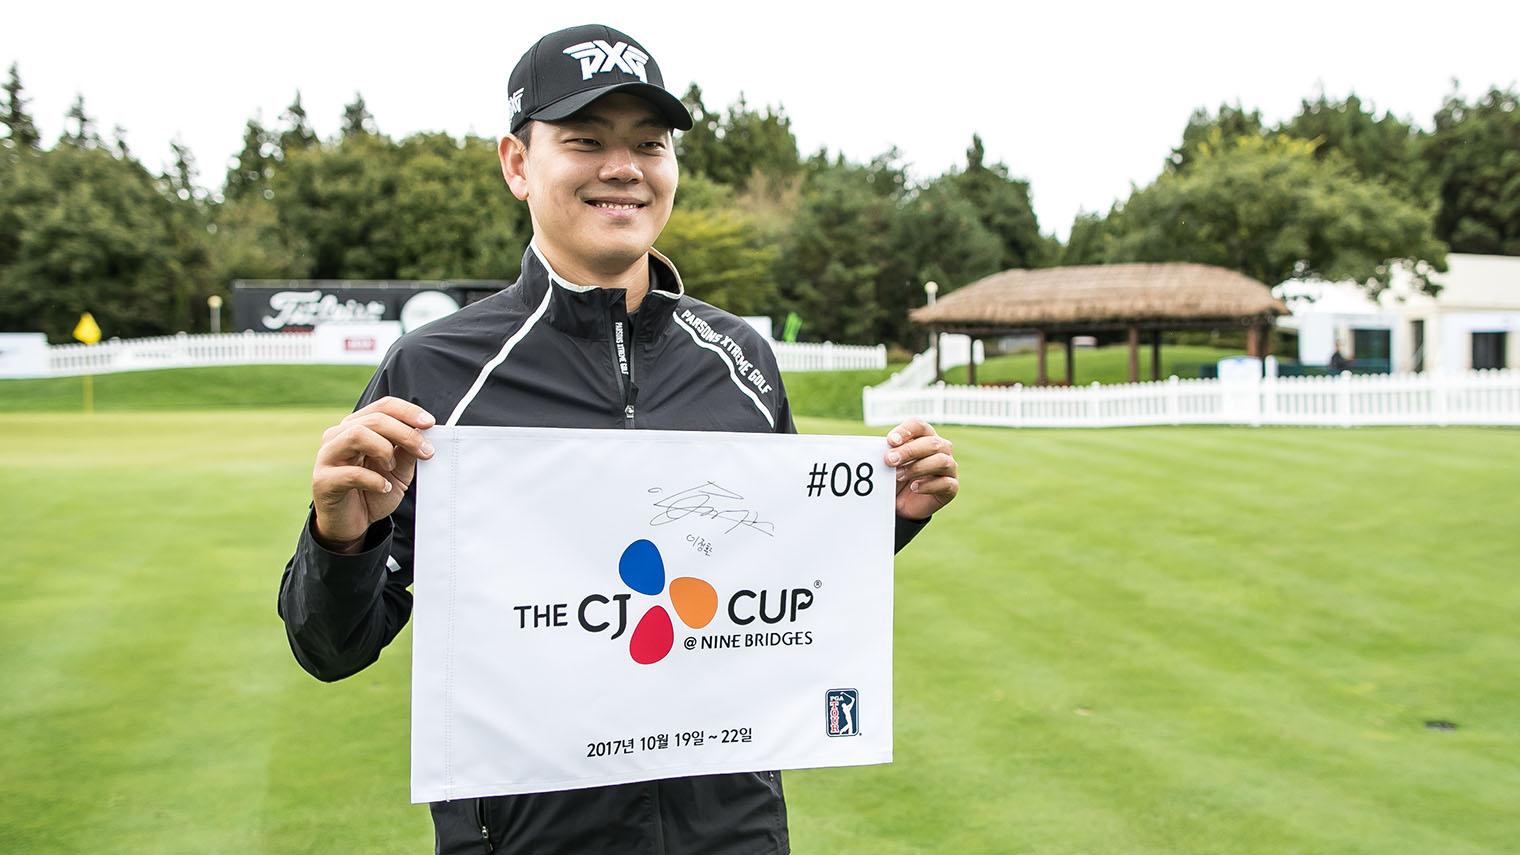 THE CJ CUP @ NINE BRIDGES 사인을 하고 활짝 웃는 이정환 선수